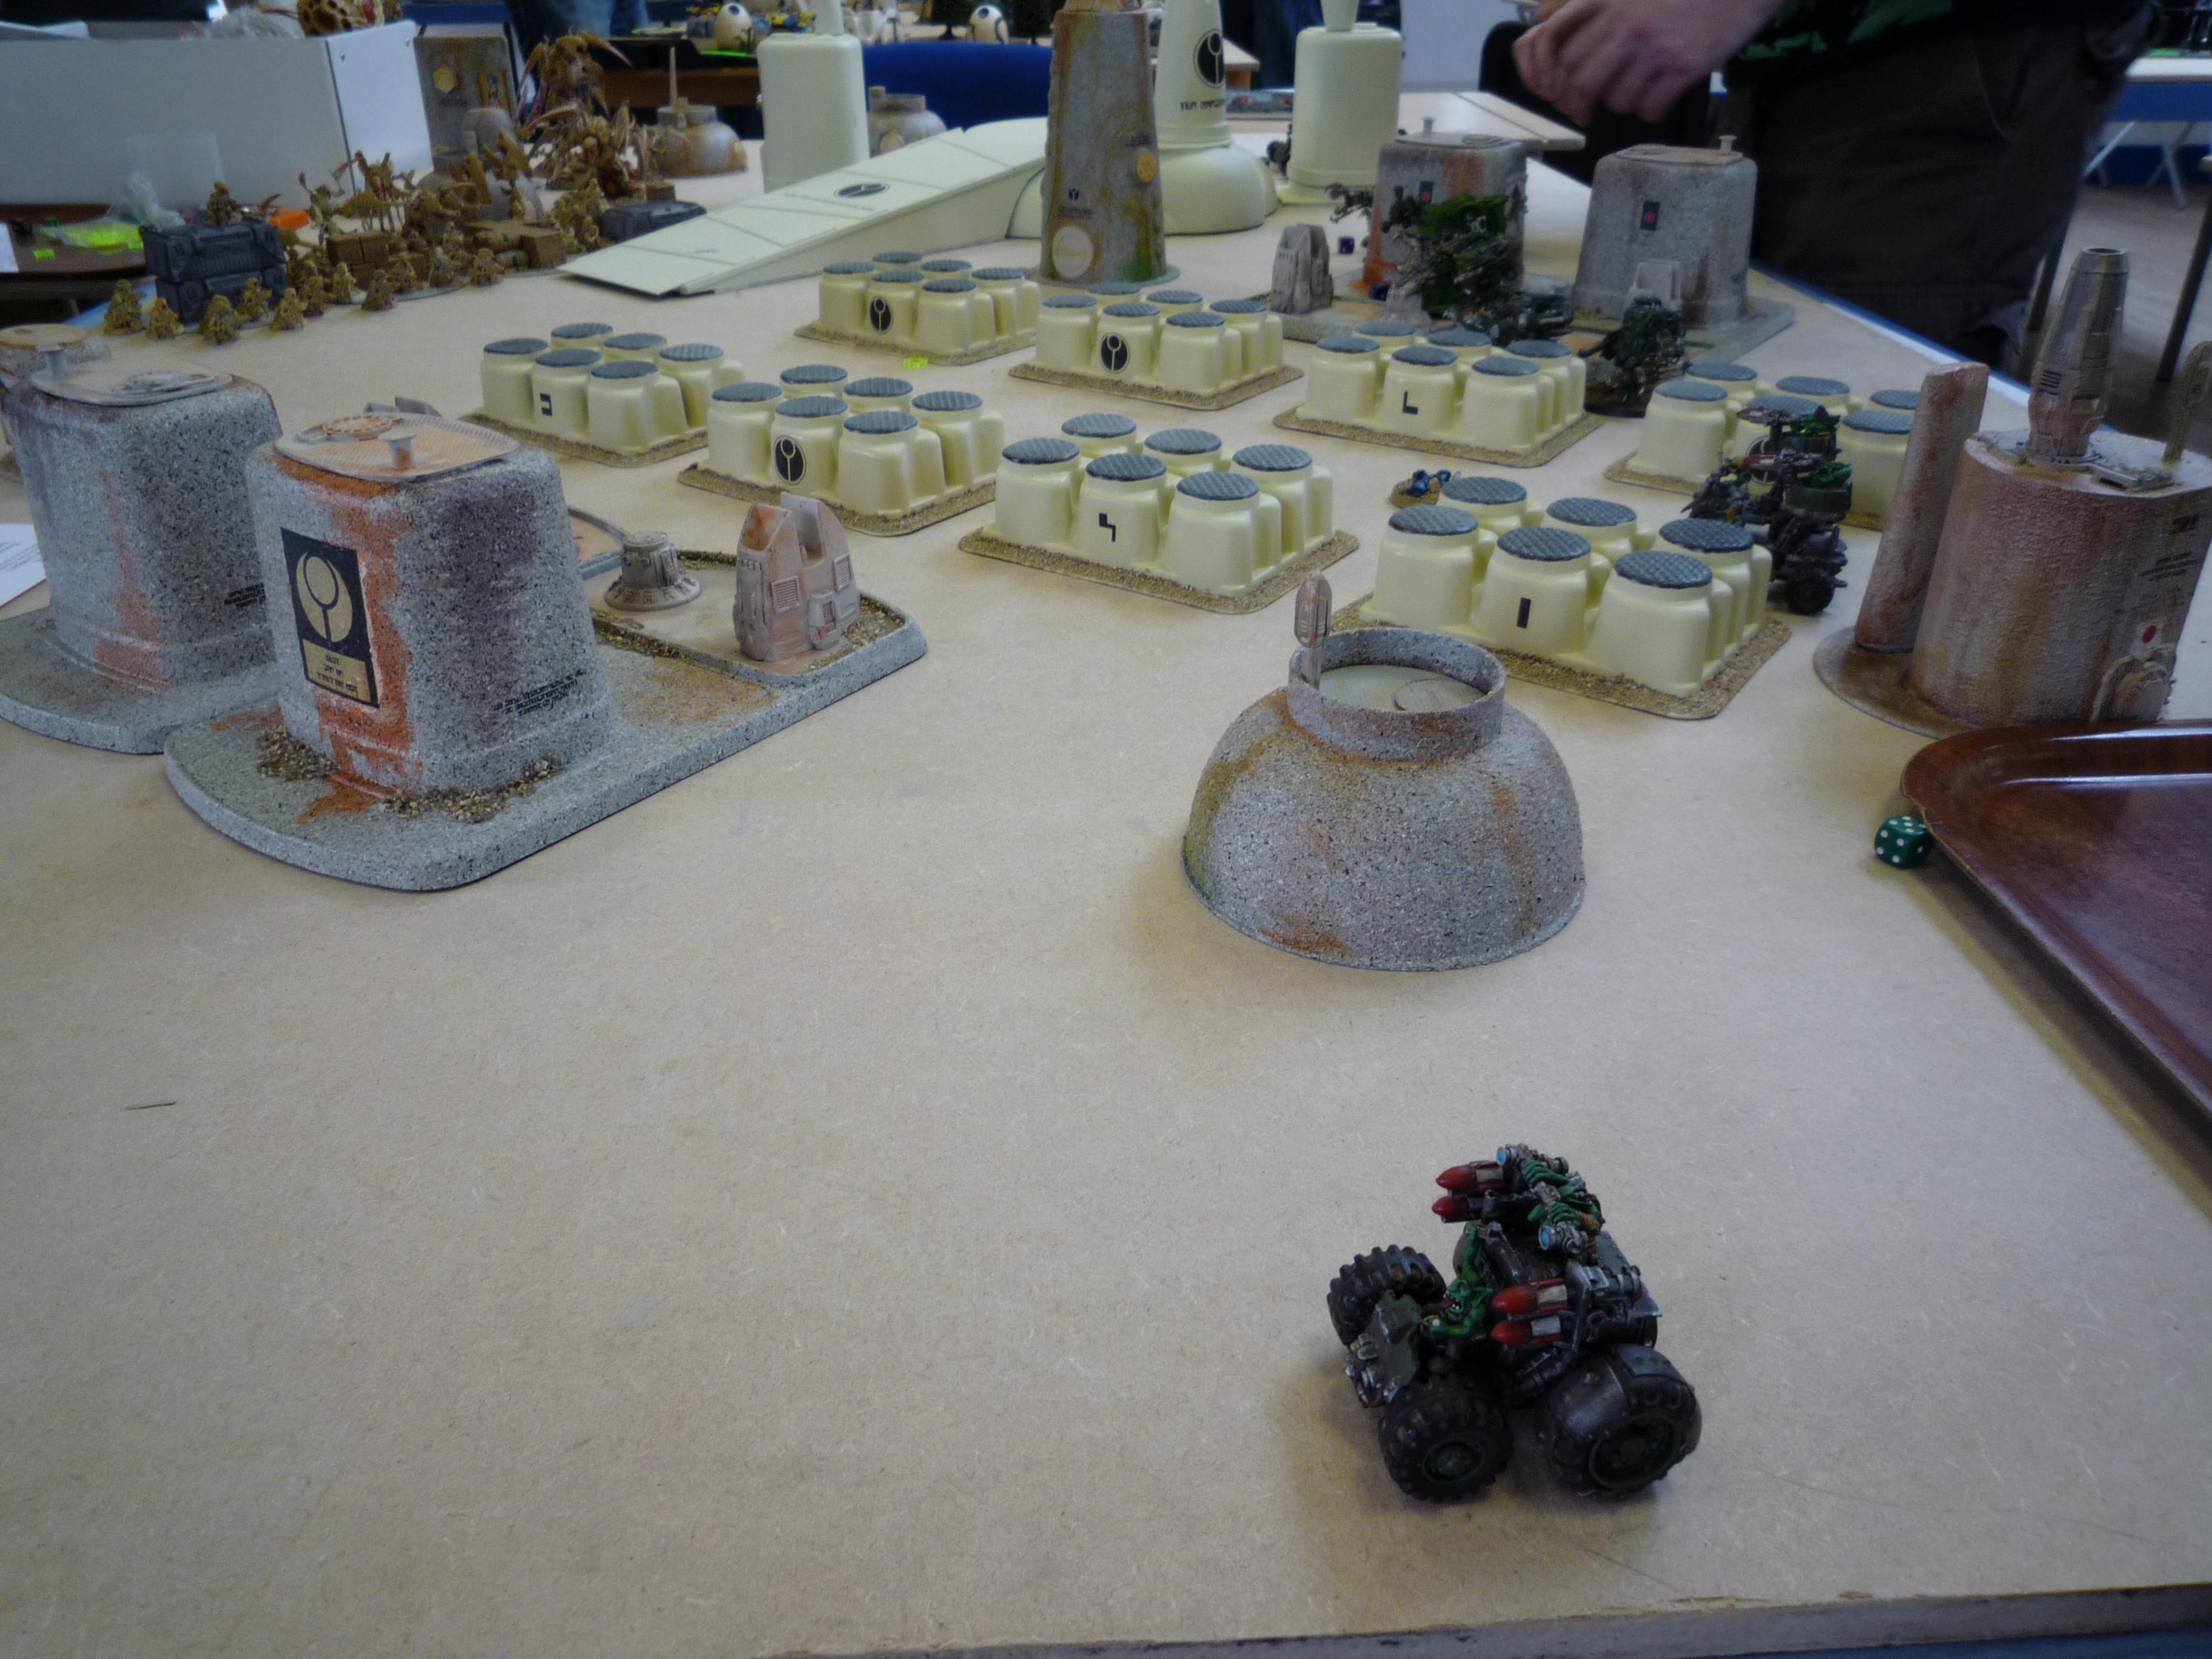 The Grot Rebellion faces Hive Fleet Kielbasa